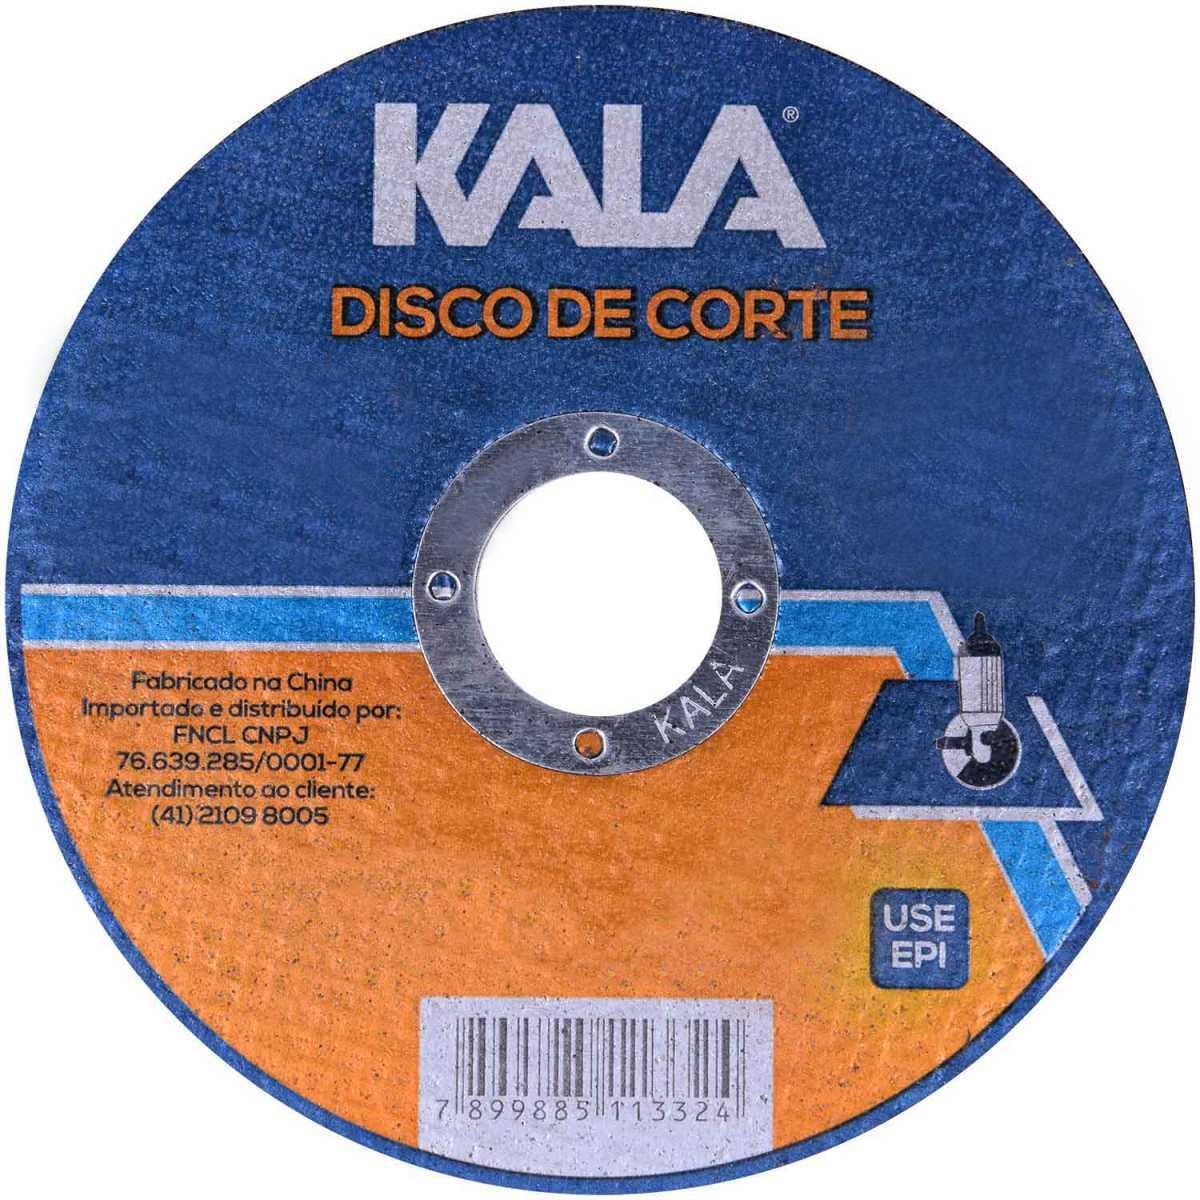 Disco de Corte Inox 115Mmx1Mmx22,23Mm Kala 50 Peças